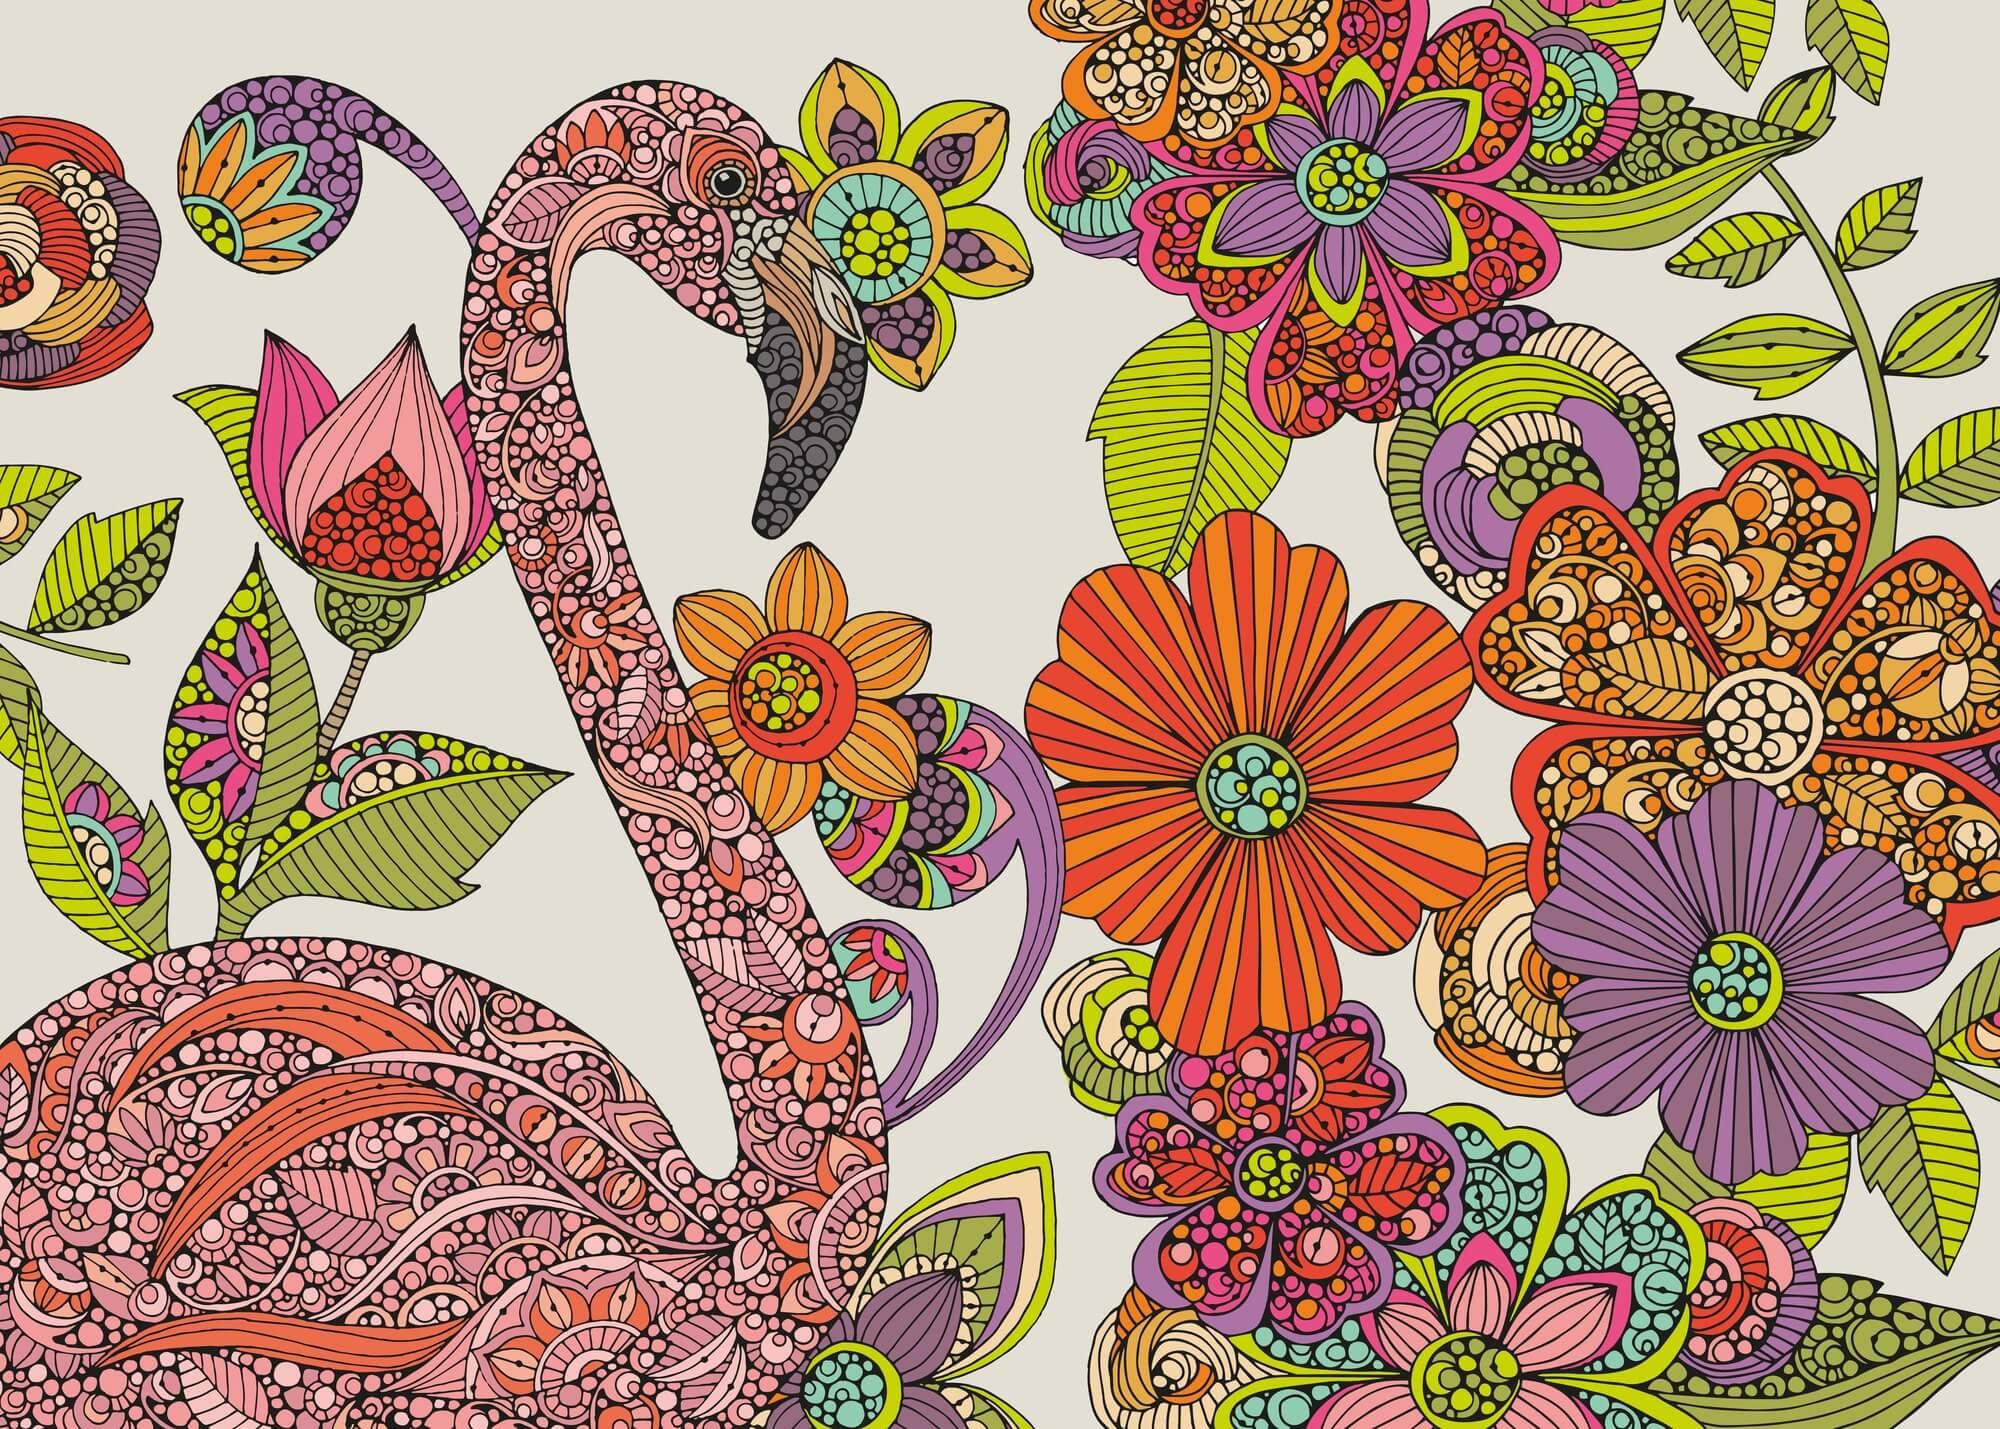 Flamingo Puzzle Wallpaper | Wallsauce US